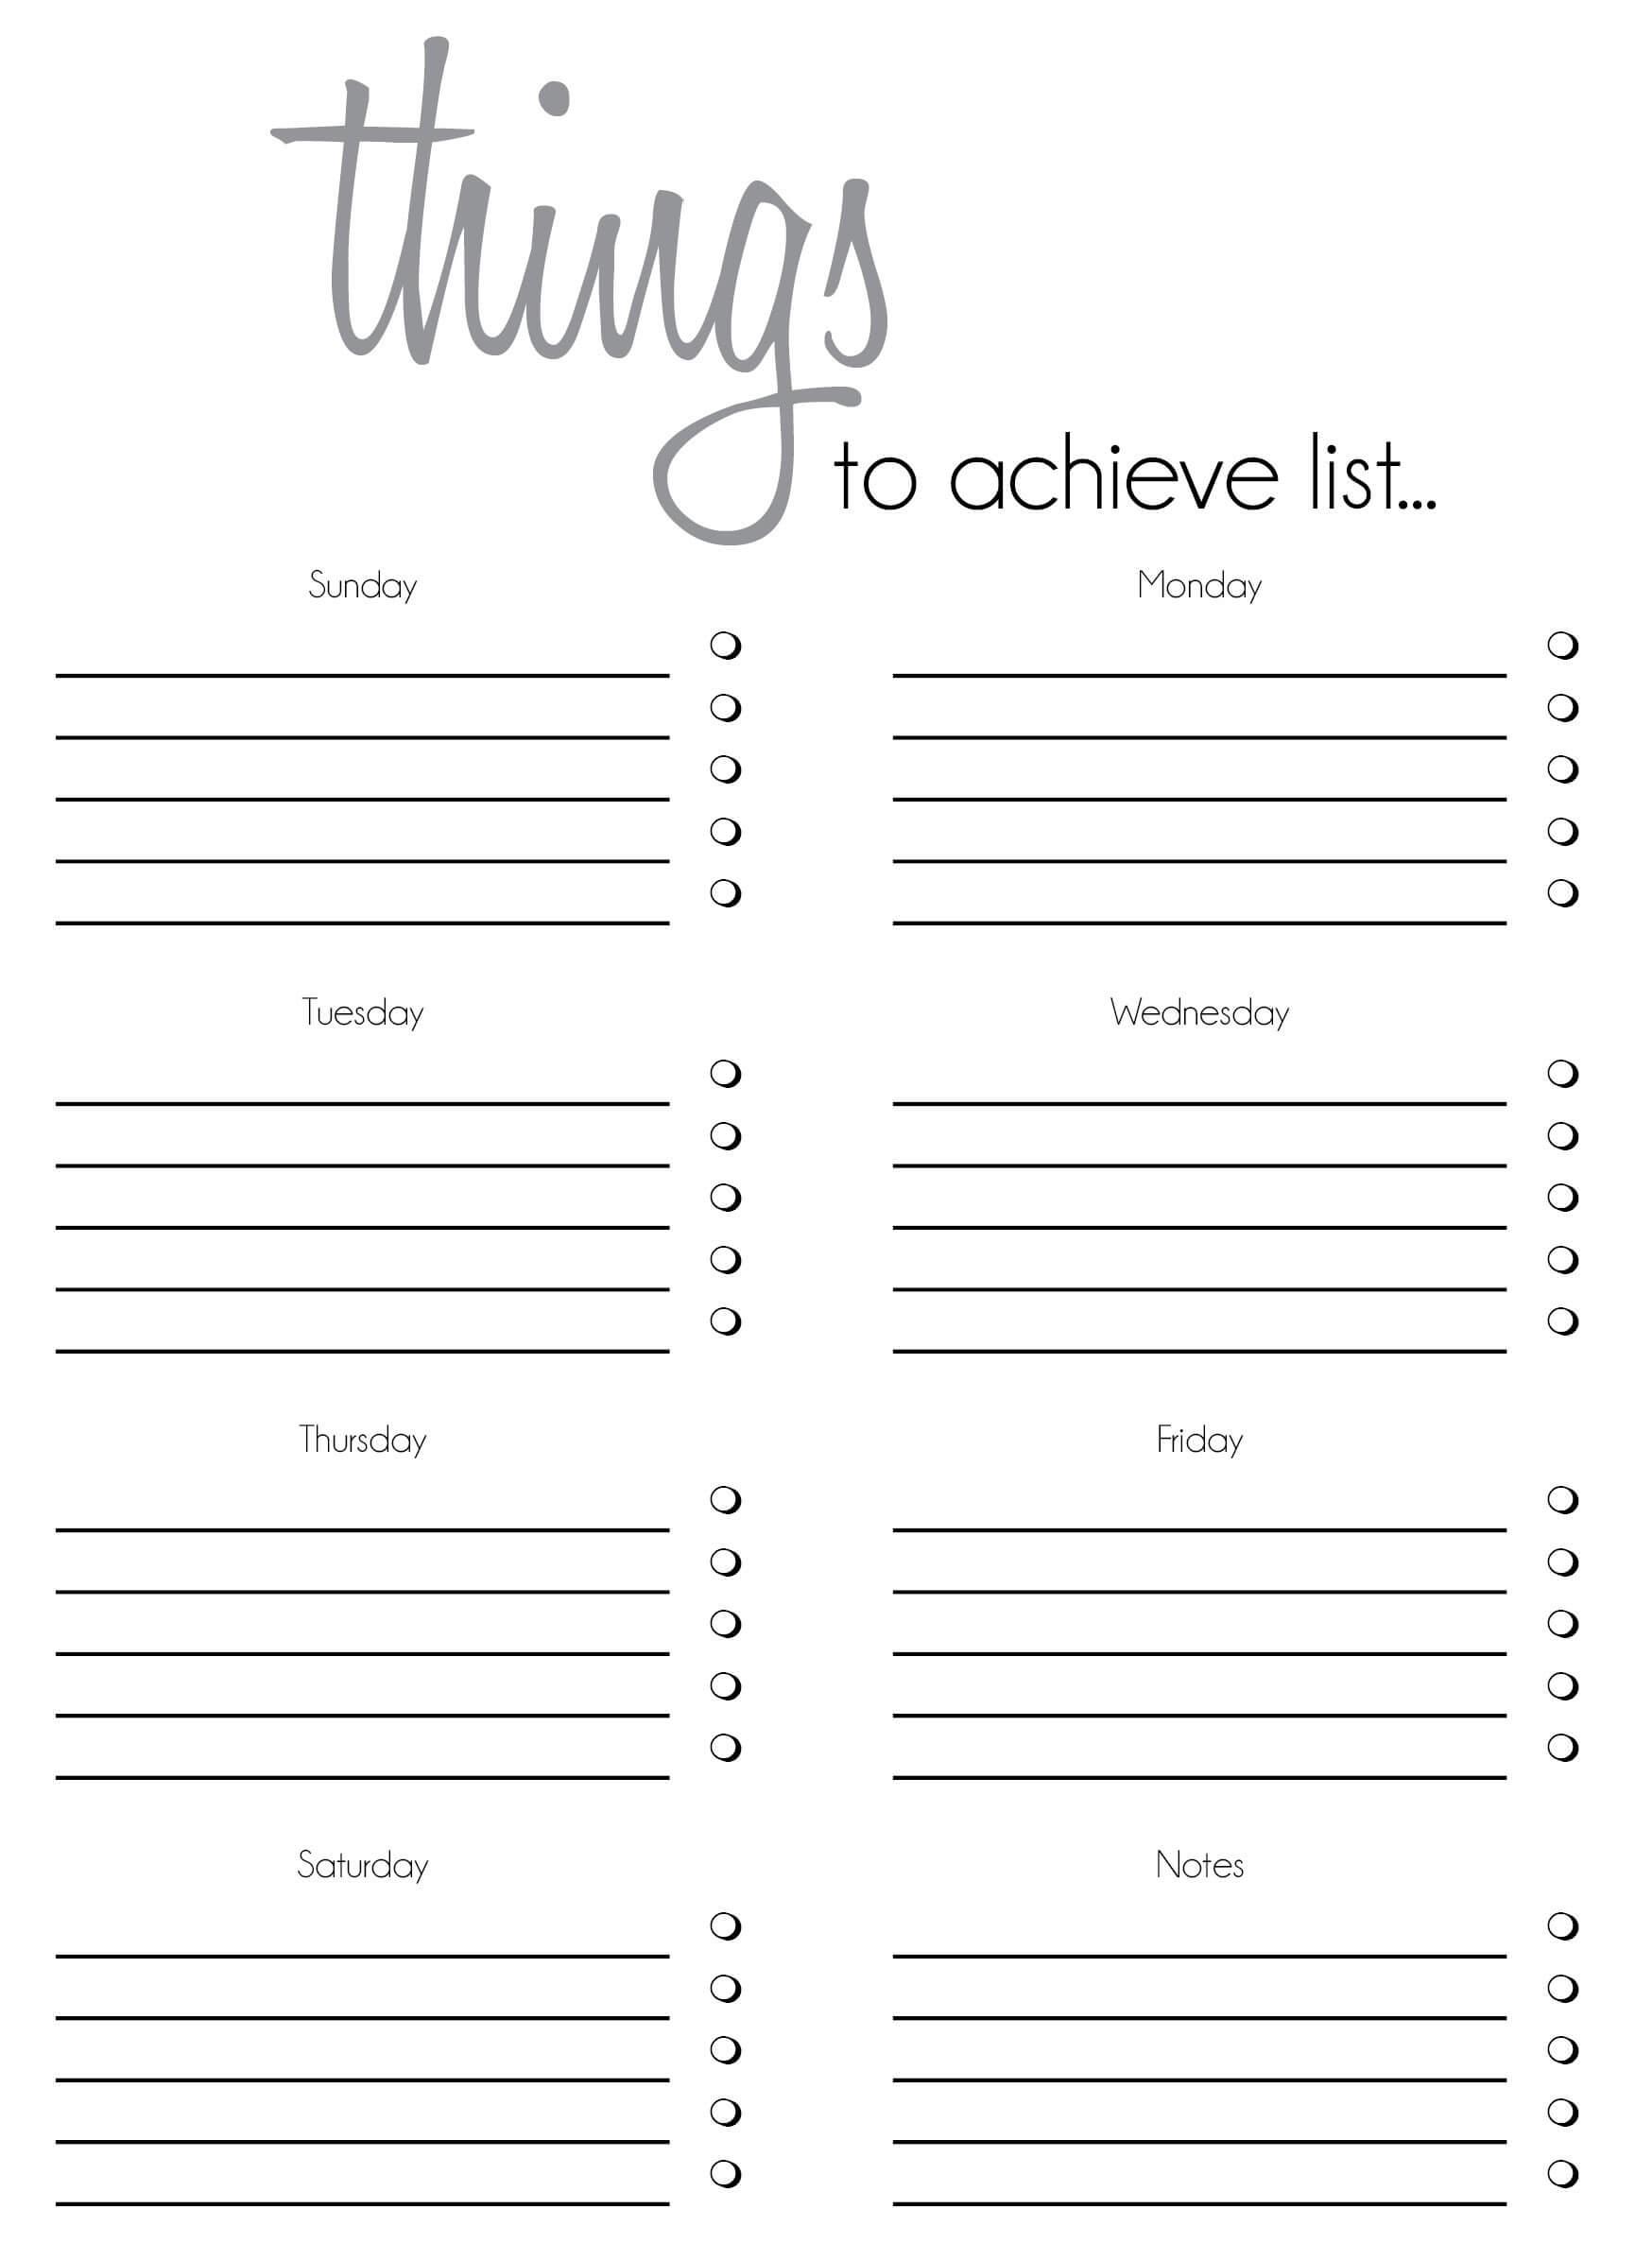 Free Printable To Do List Templates | Latest Calendar Regarding Blank To Do List Template